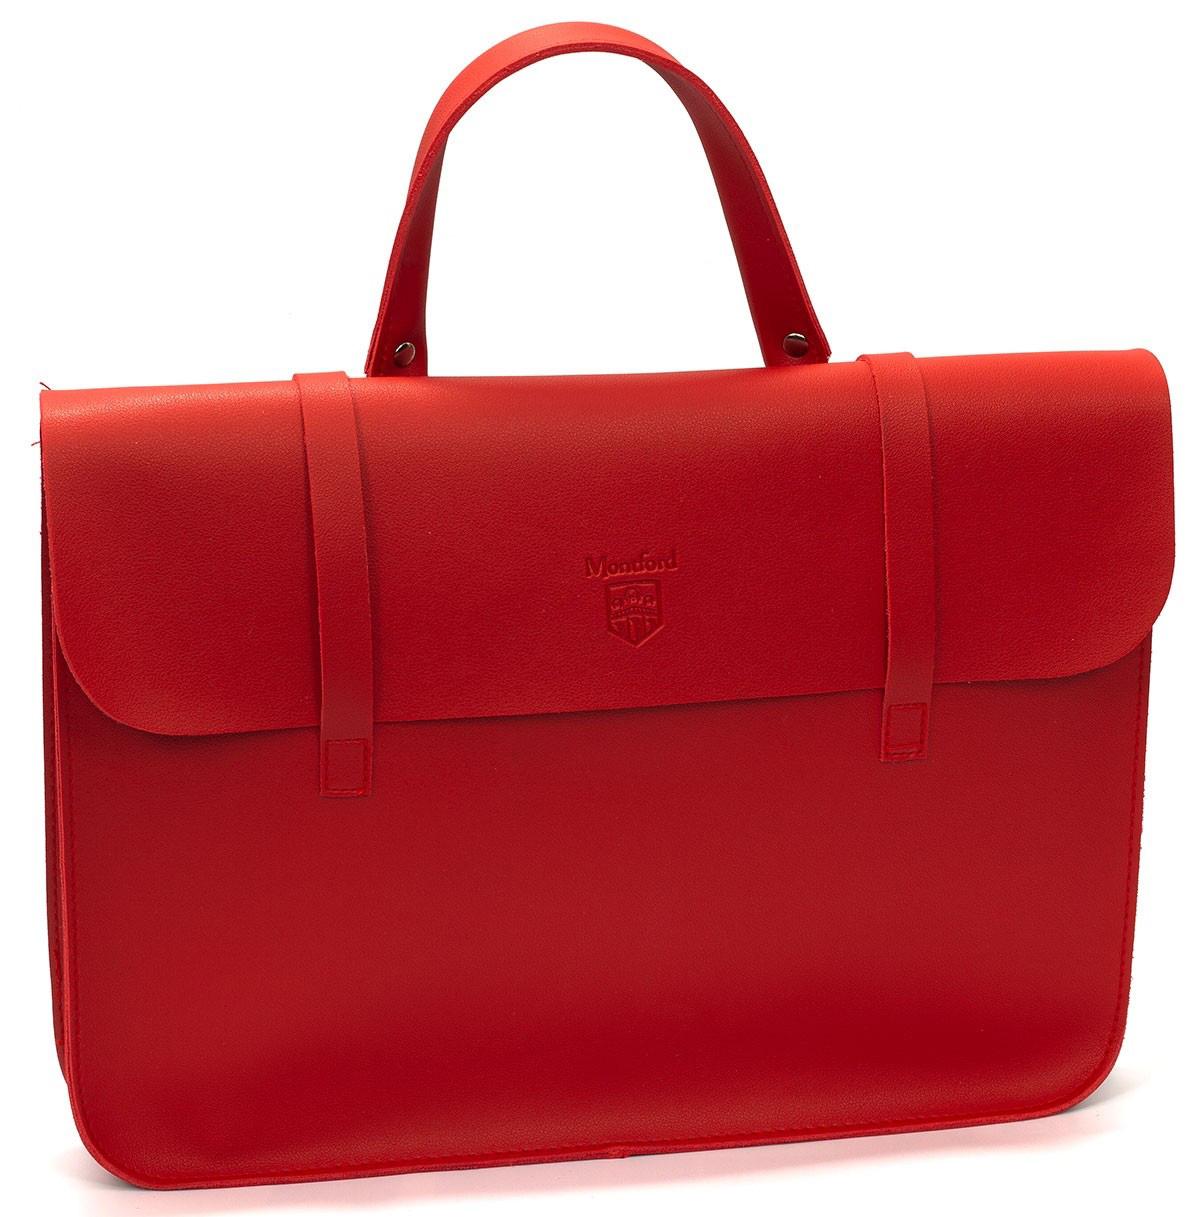 Music Case Bag Red: Case